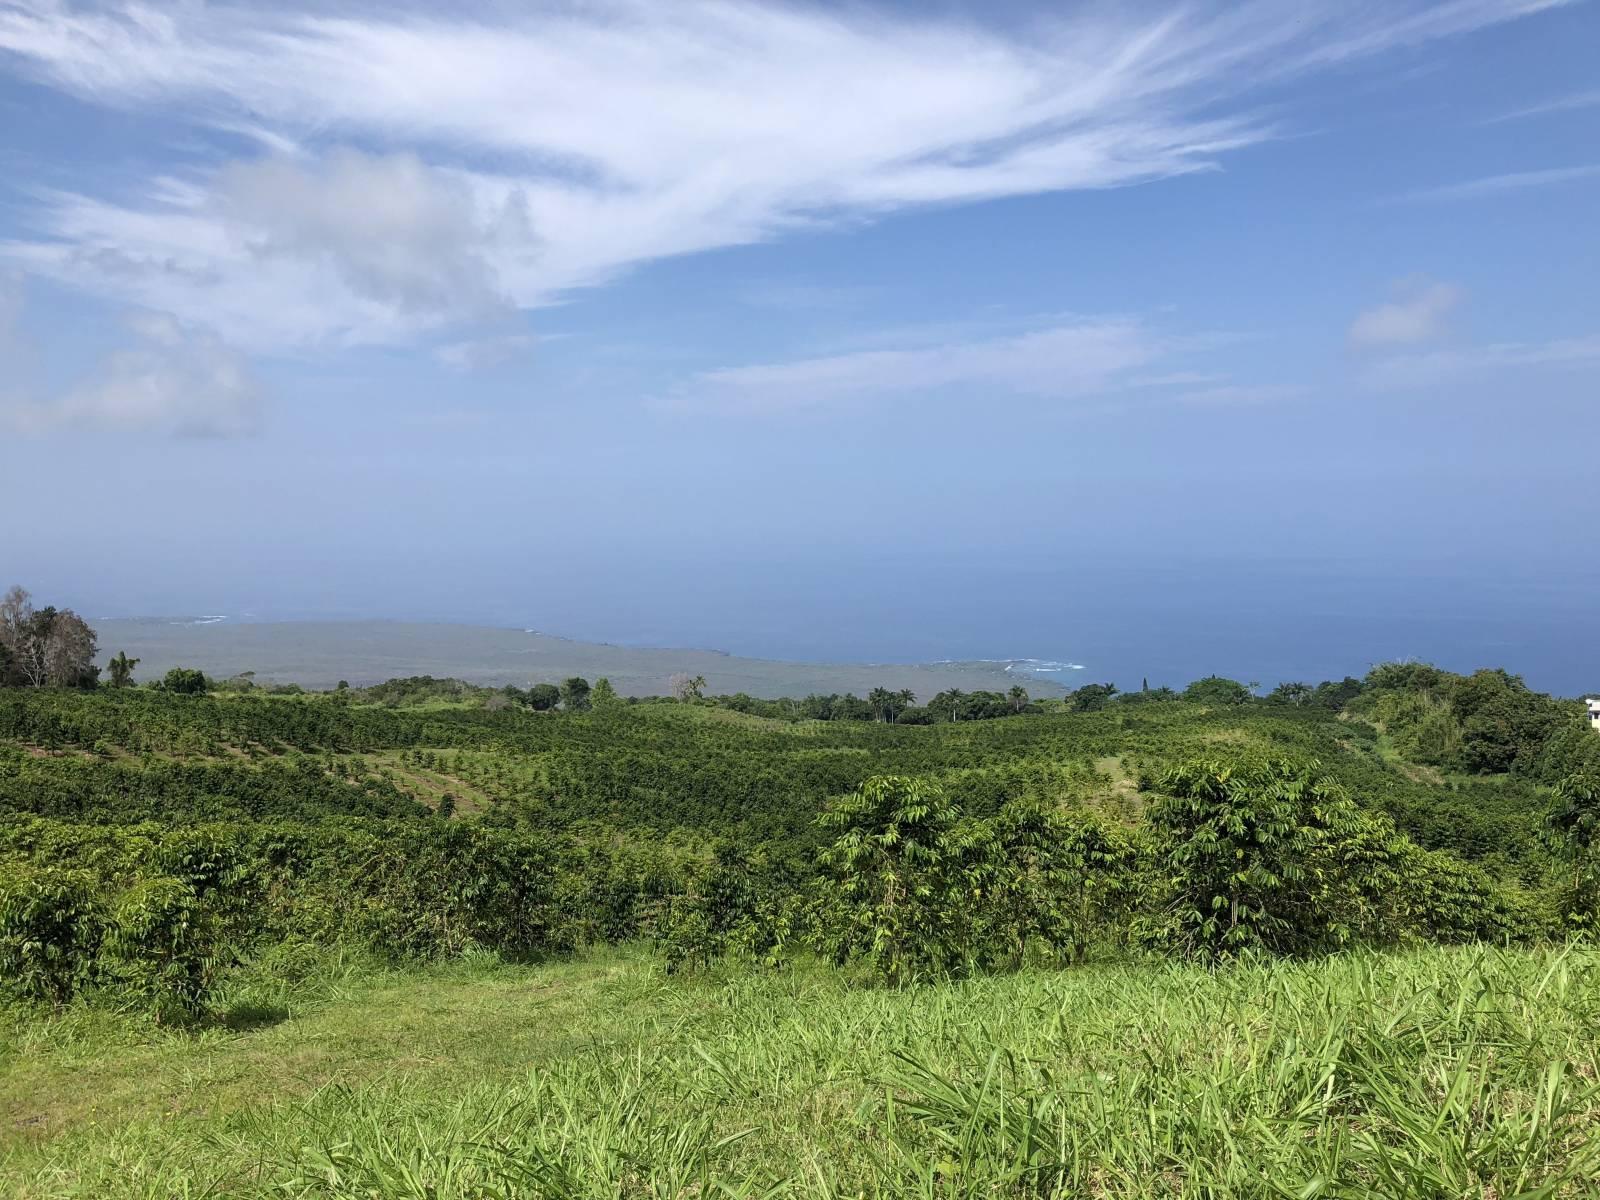 Coffee Farm in Kealakekua Hawaii